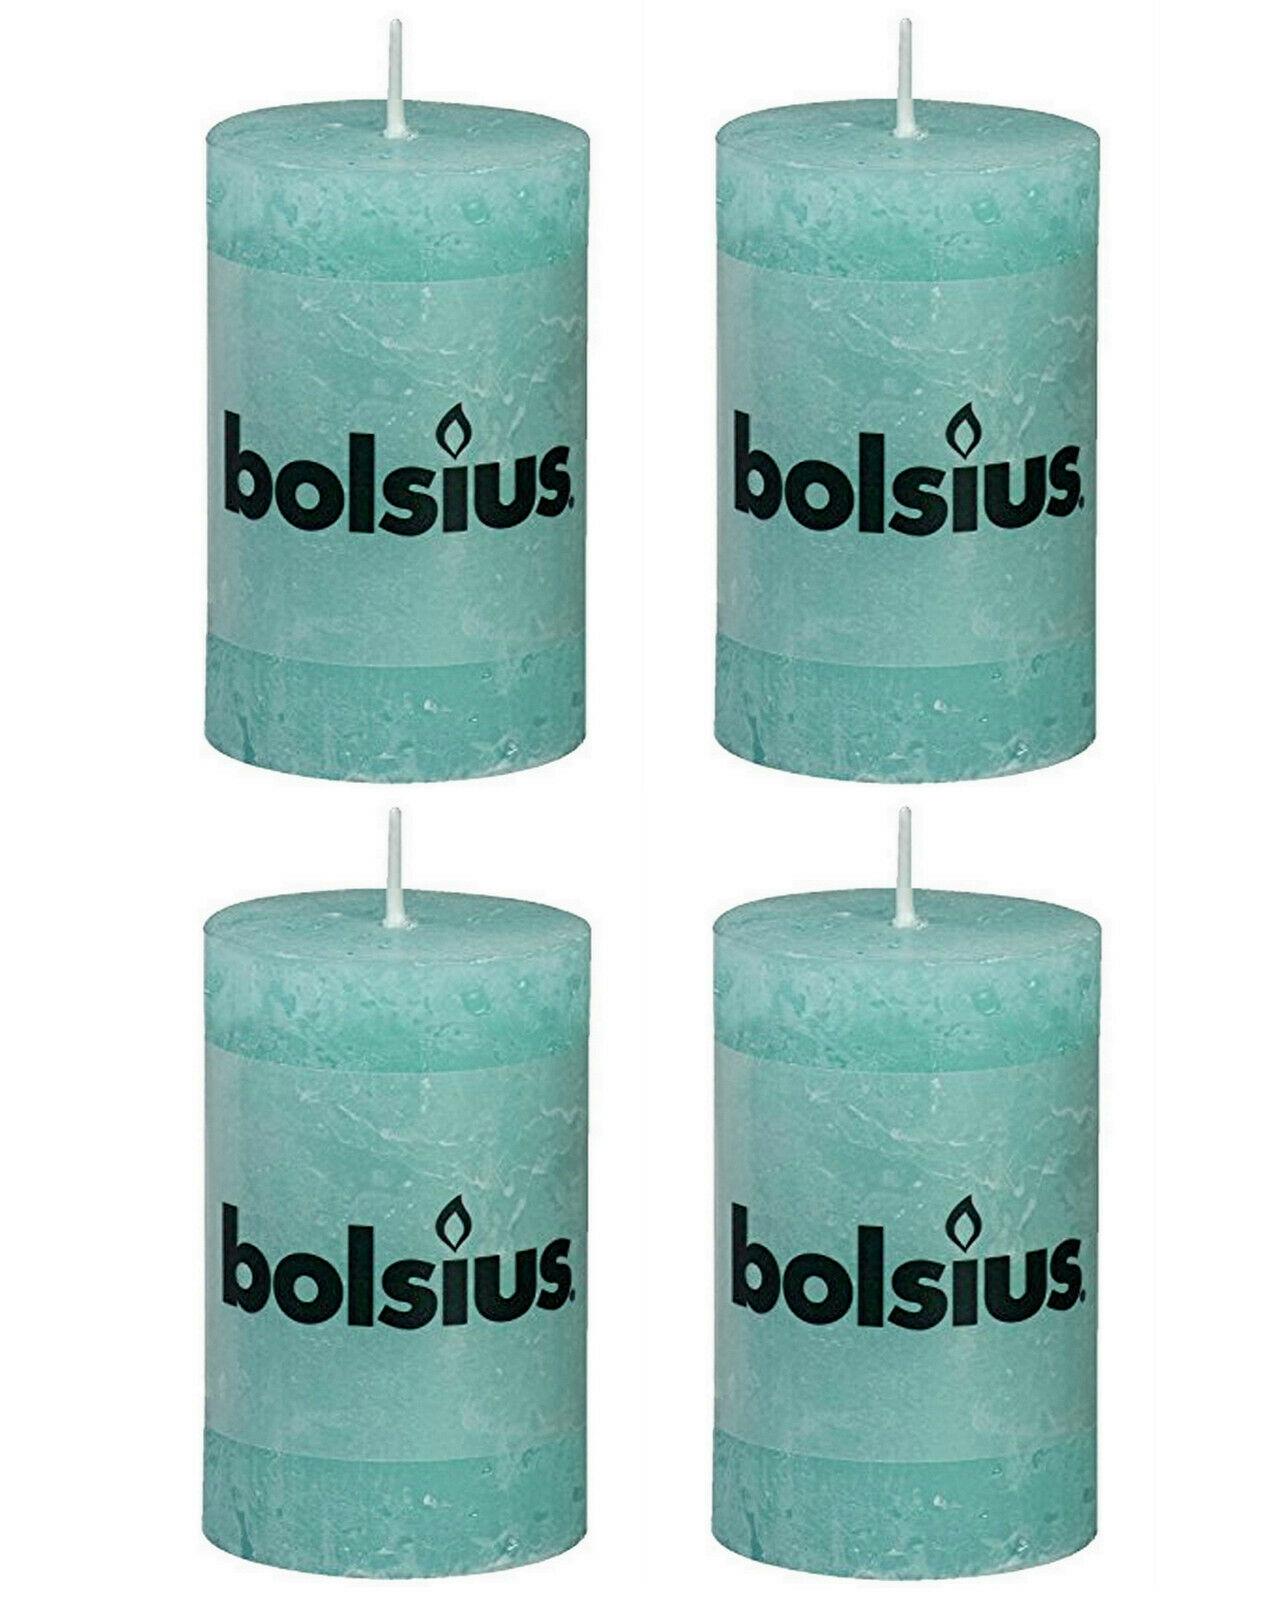 8 Stück Bolsius Rustic Stumpenkerzen 80x50 mm Qualitäts-Kerzen Candle  - Aqua